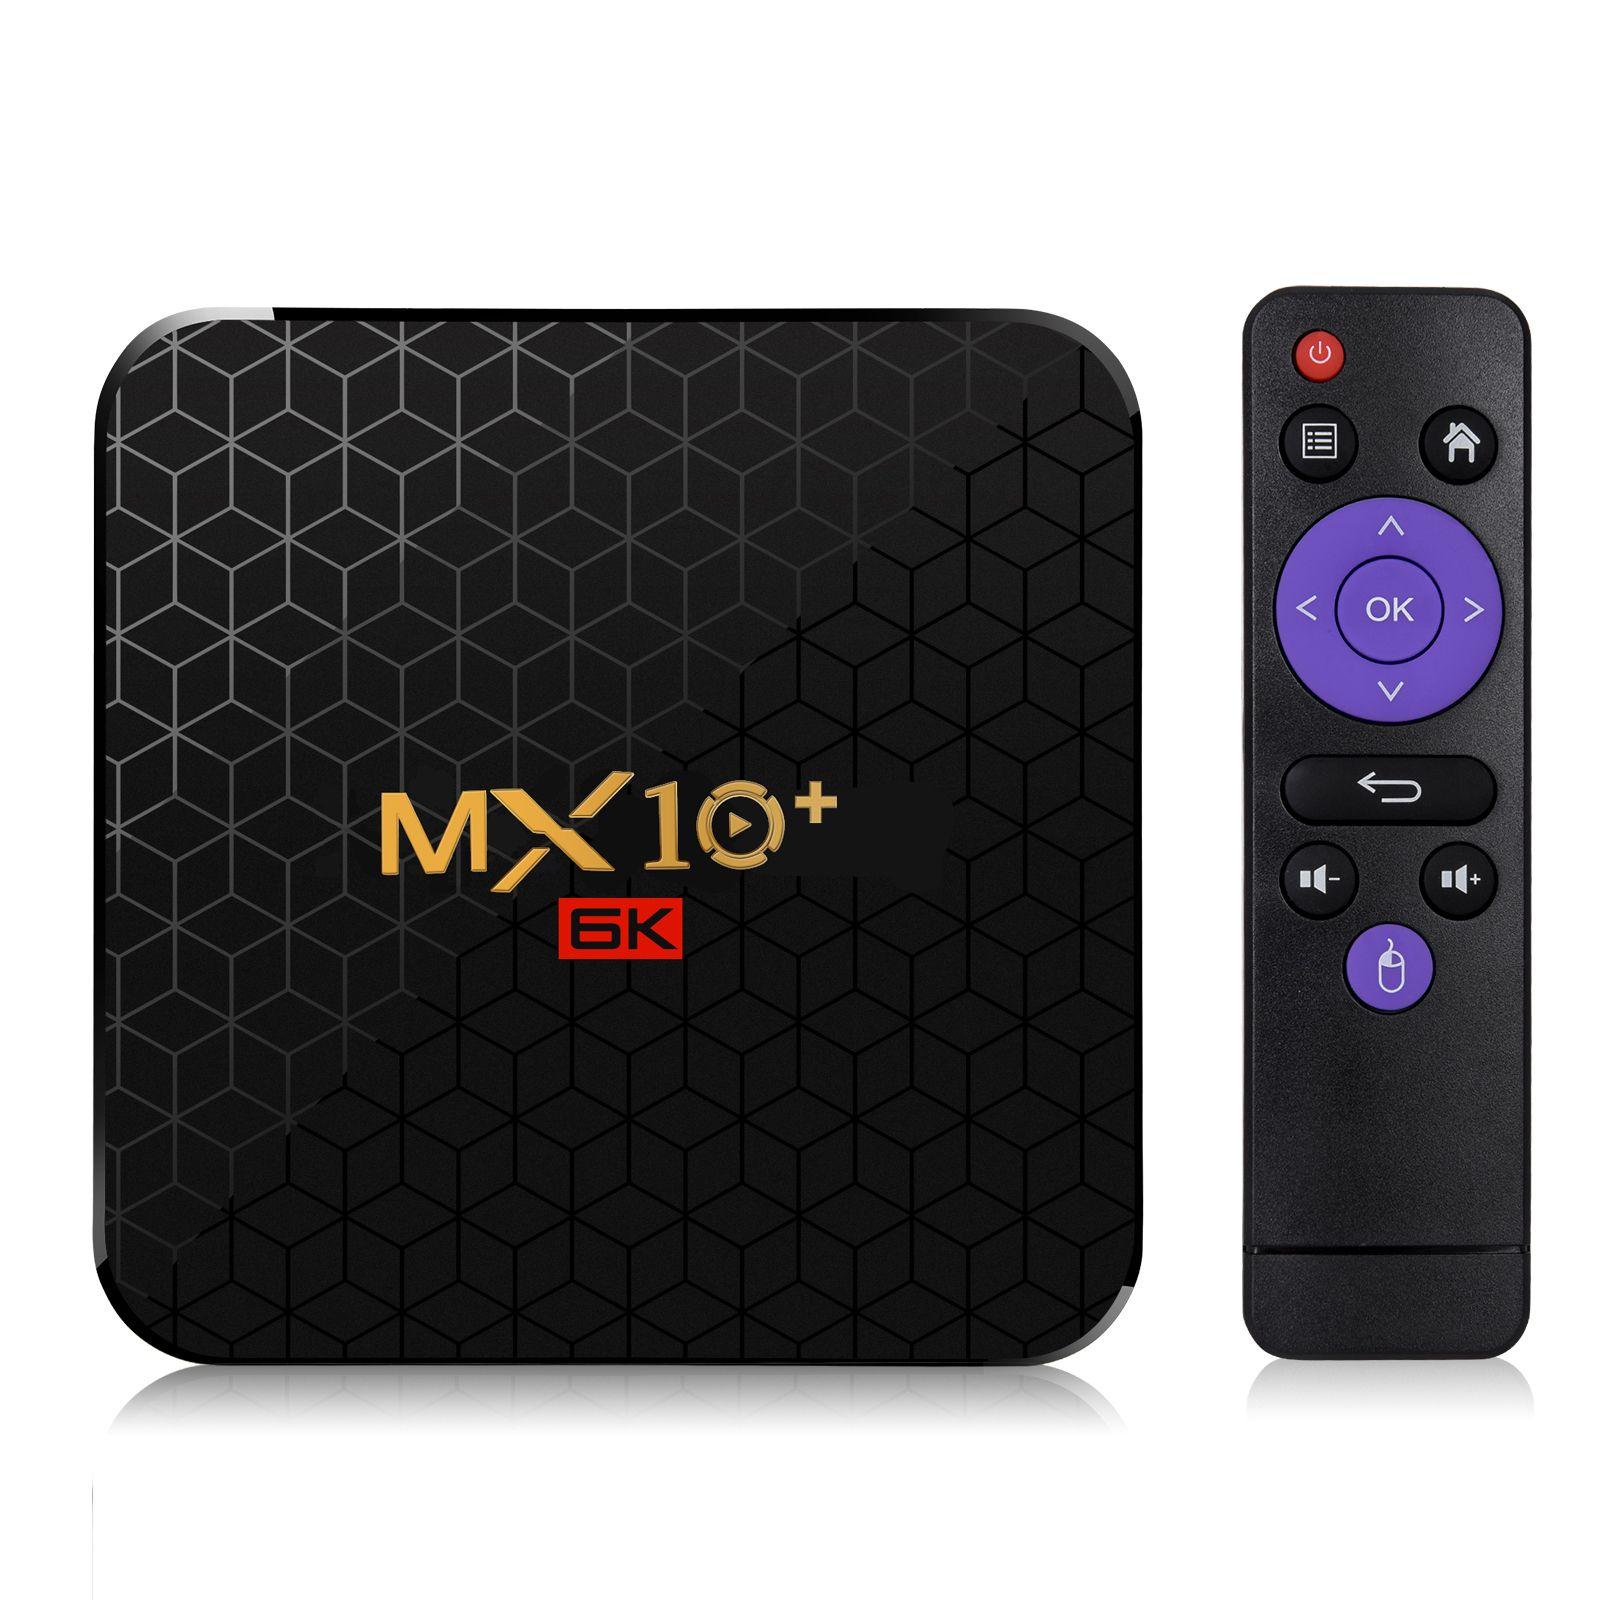 Latest android 9.0 TV BOX MX10+ allwinner H6 Quad-Core 4GB/64GB 4GB/32GB built-in 2.4G/5GWIFI&Bluetooth smart set top box omk